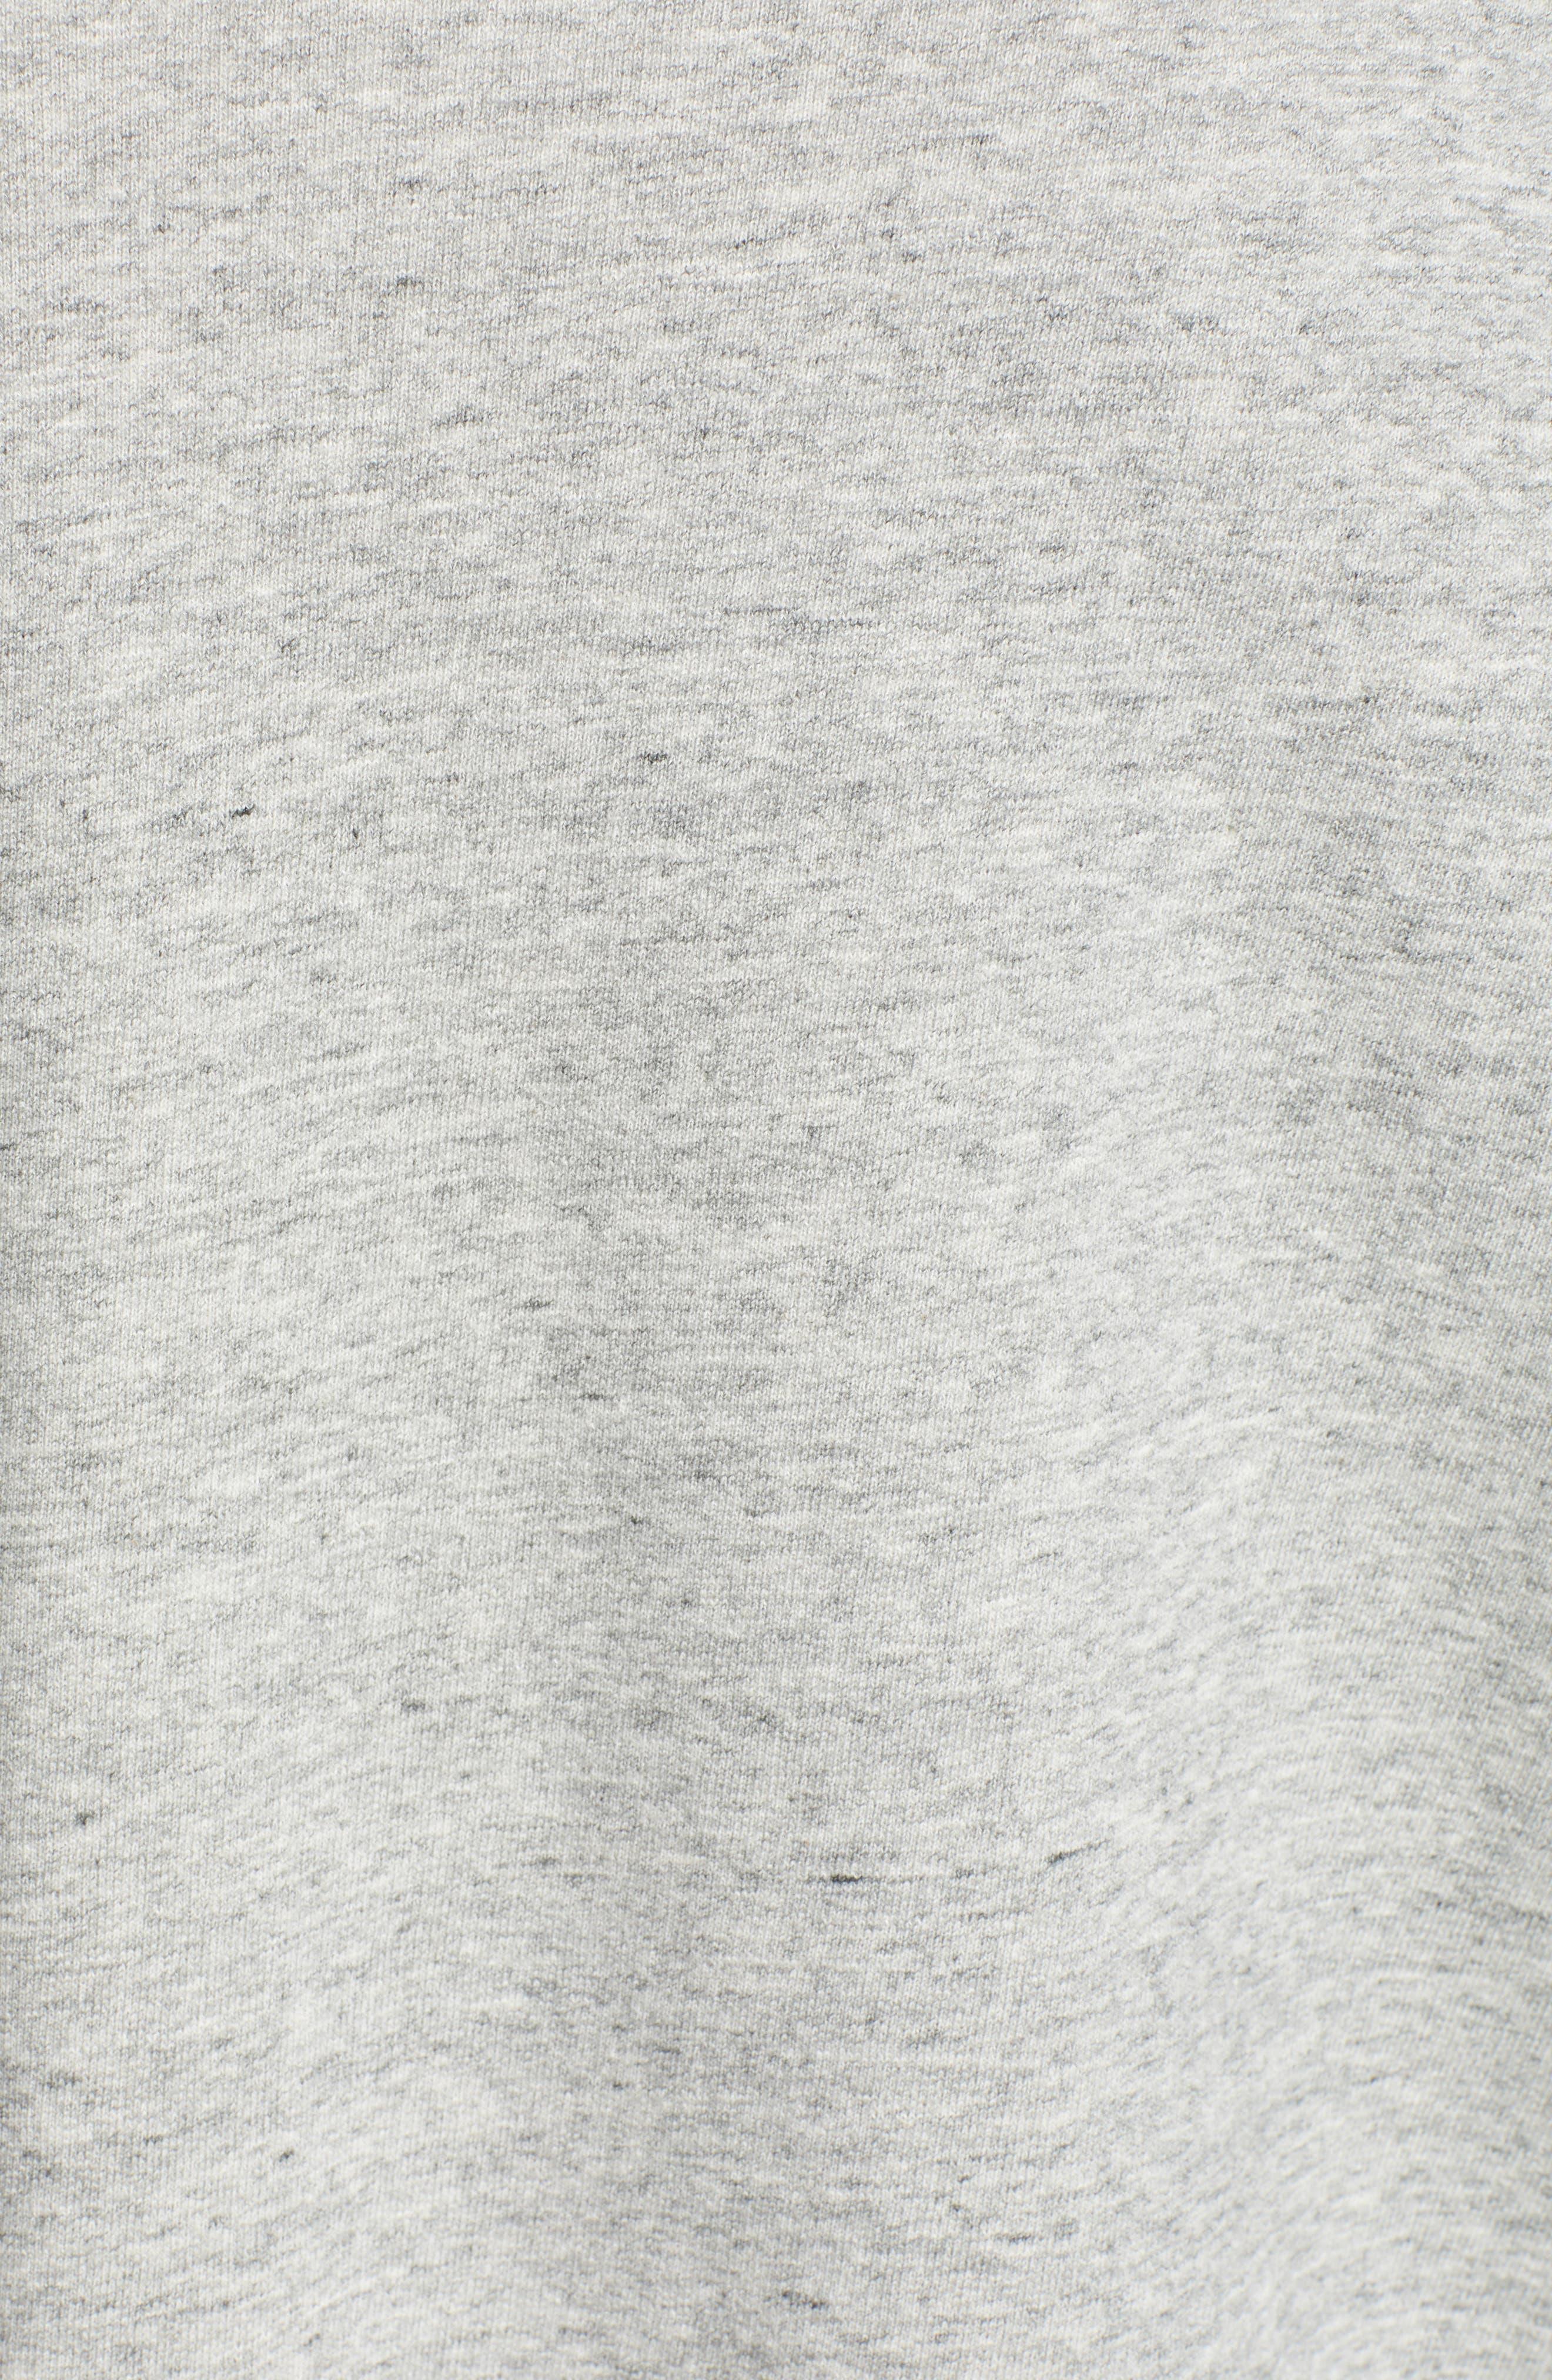 Berdine Oversize Sweatshirt,                             Alternate thumbnail 6, color,                             HEATHER GREY